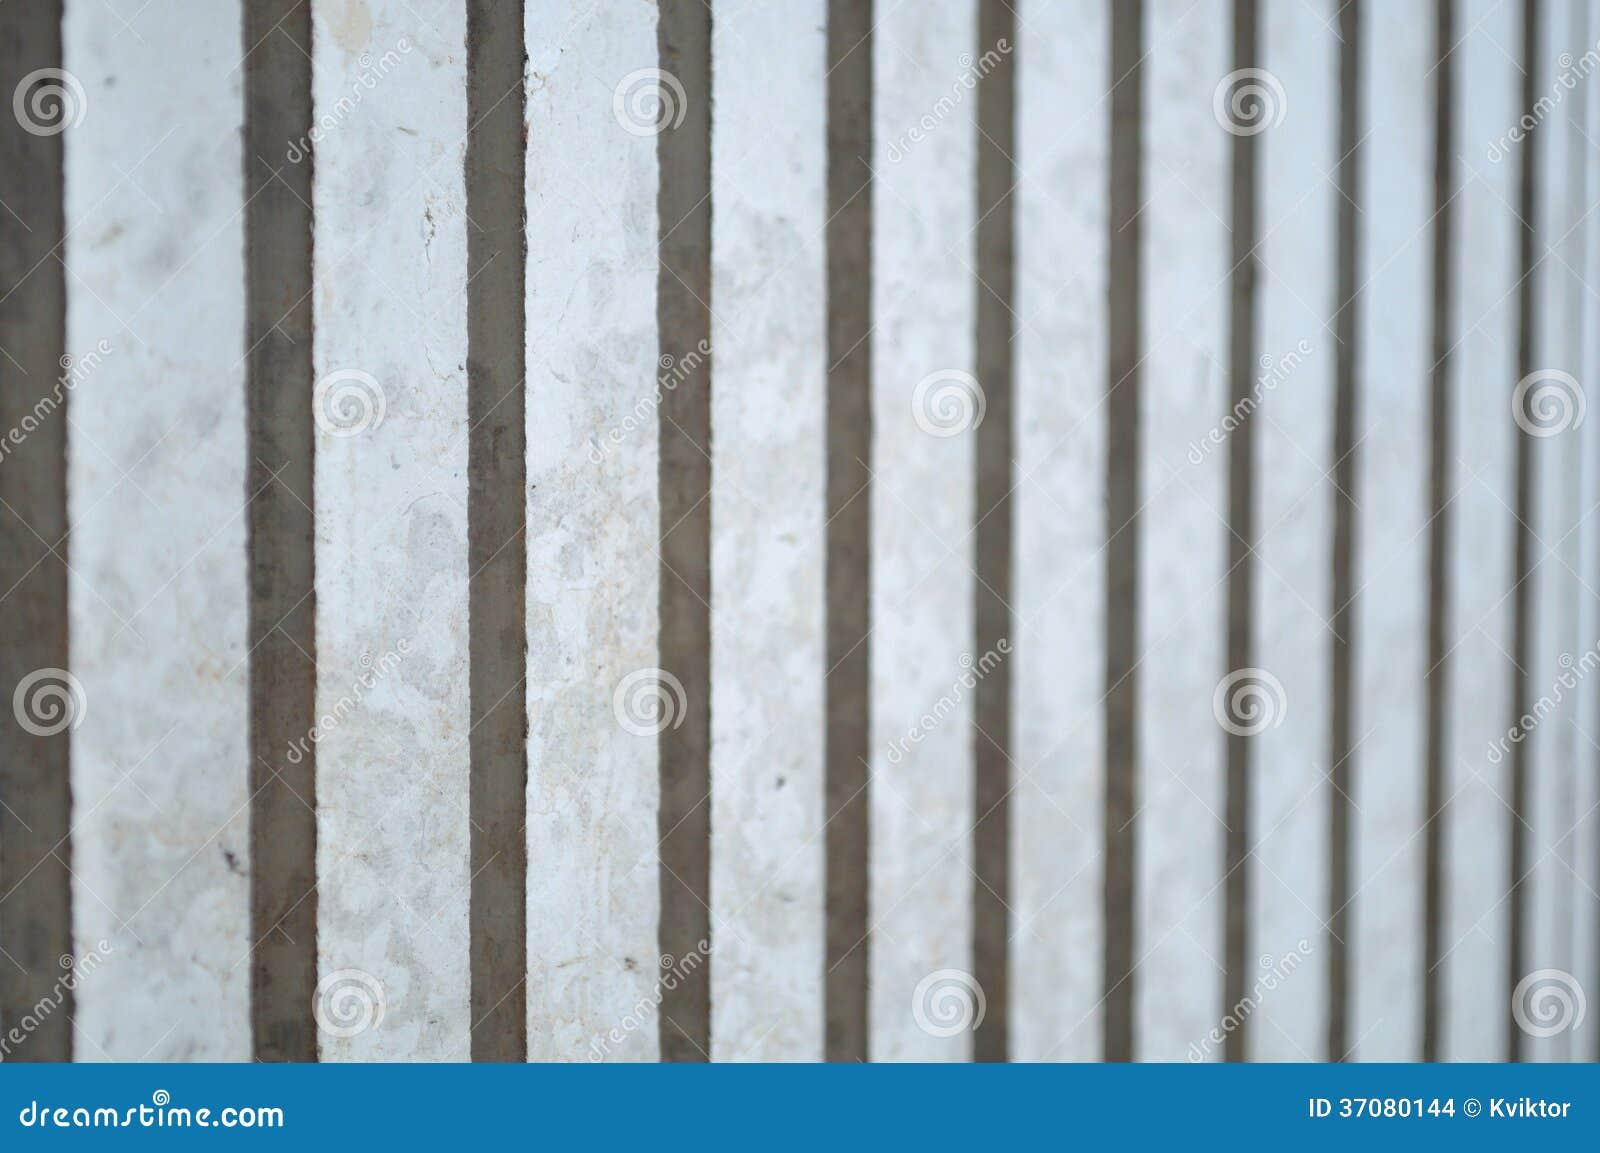 Modern Columns light and shadows on modern columns stock images - image: 37080144